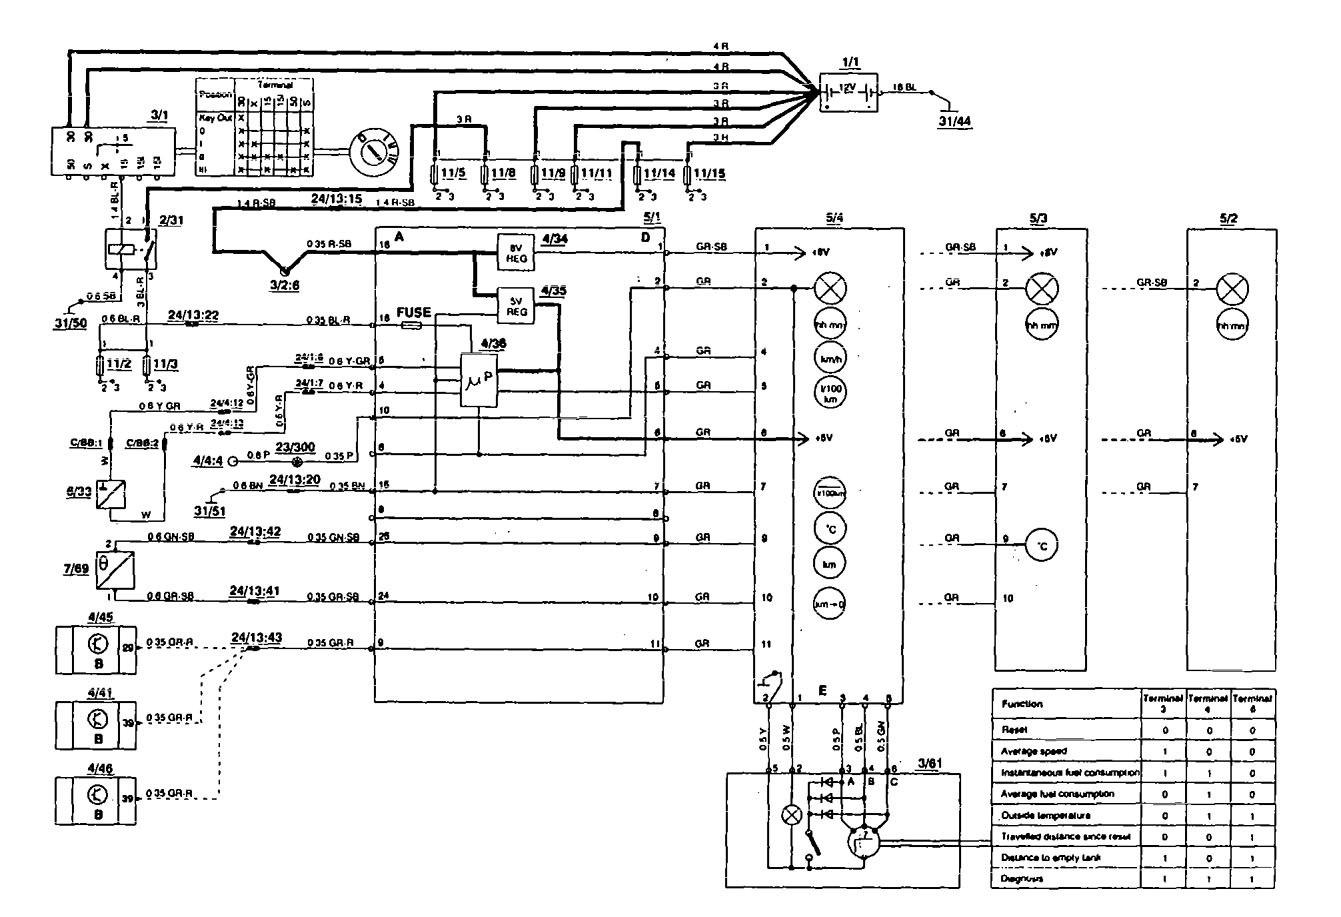 volvo wiring diagrams 850 220 to 110 diagram 1996 master electric motor